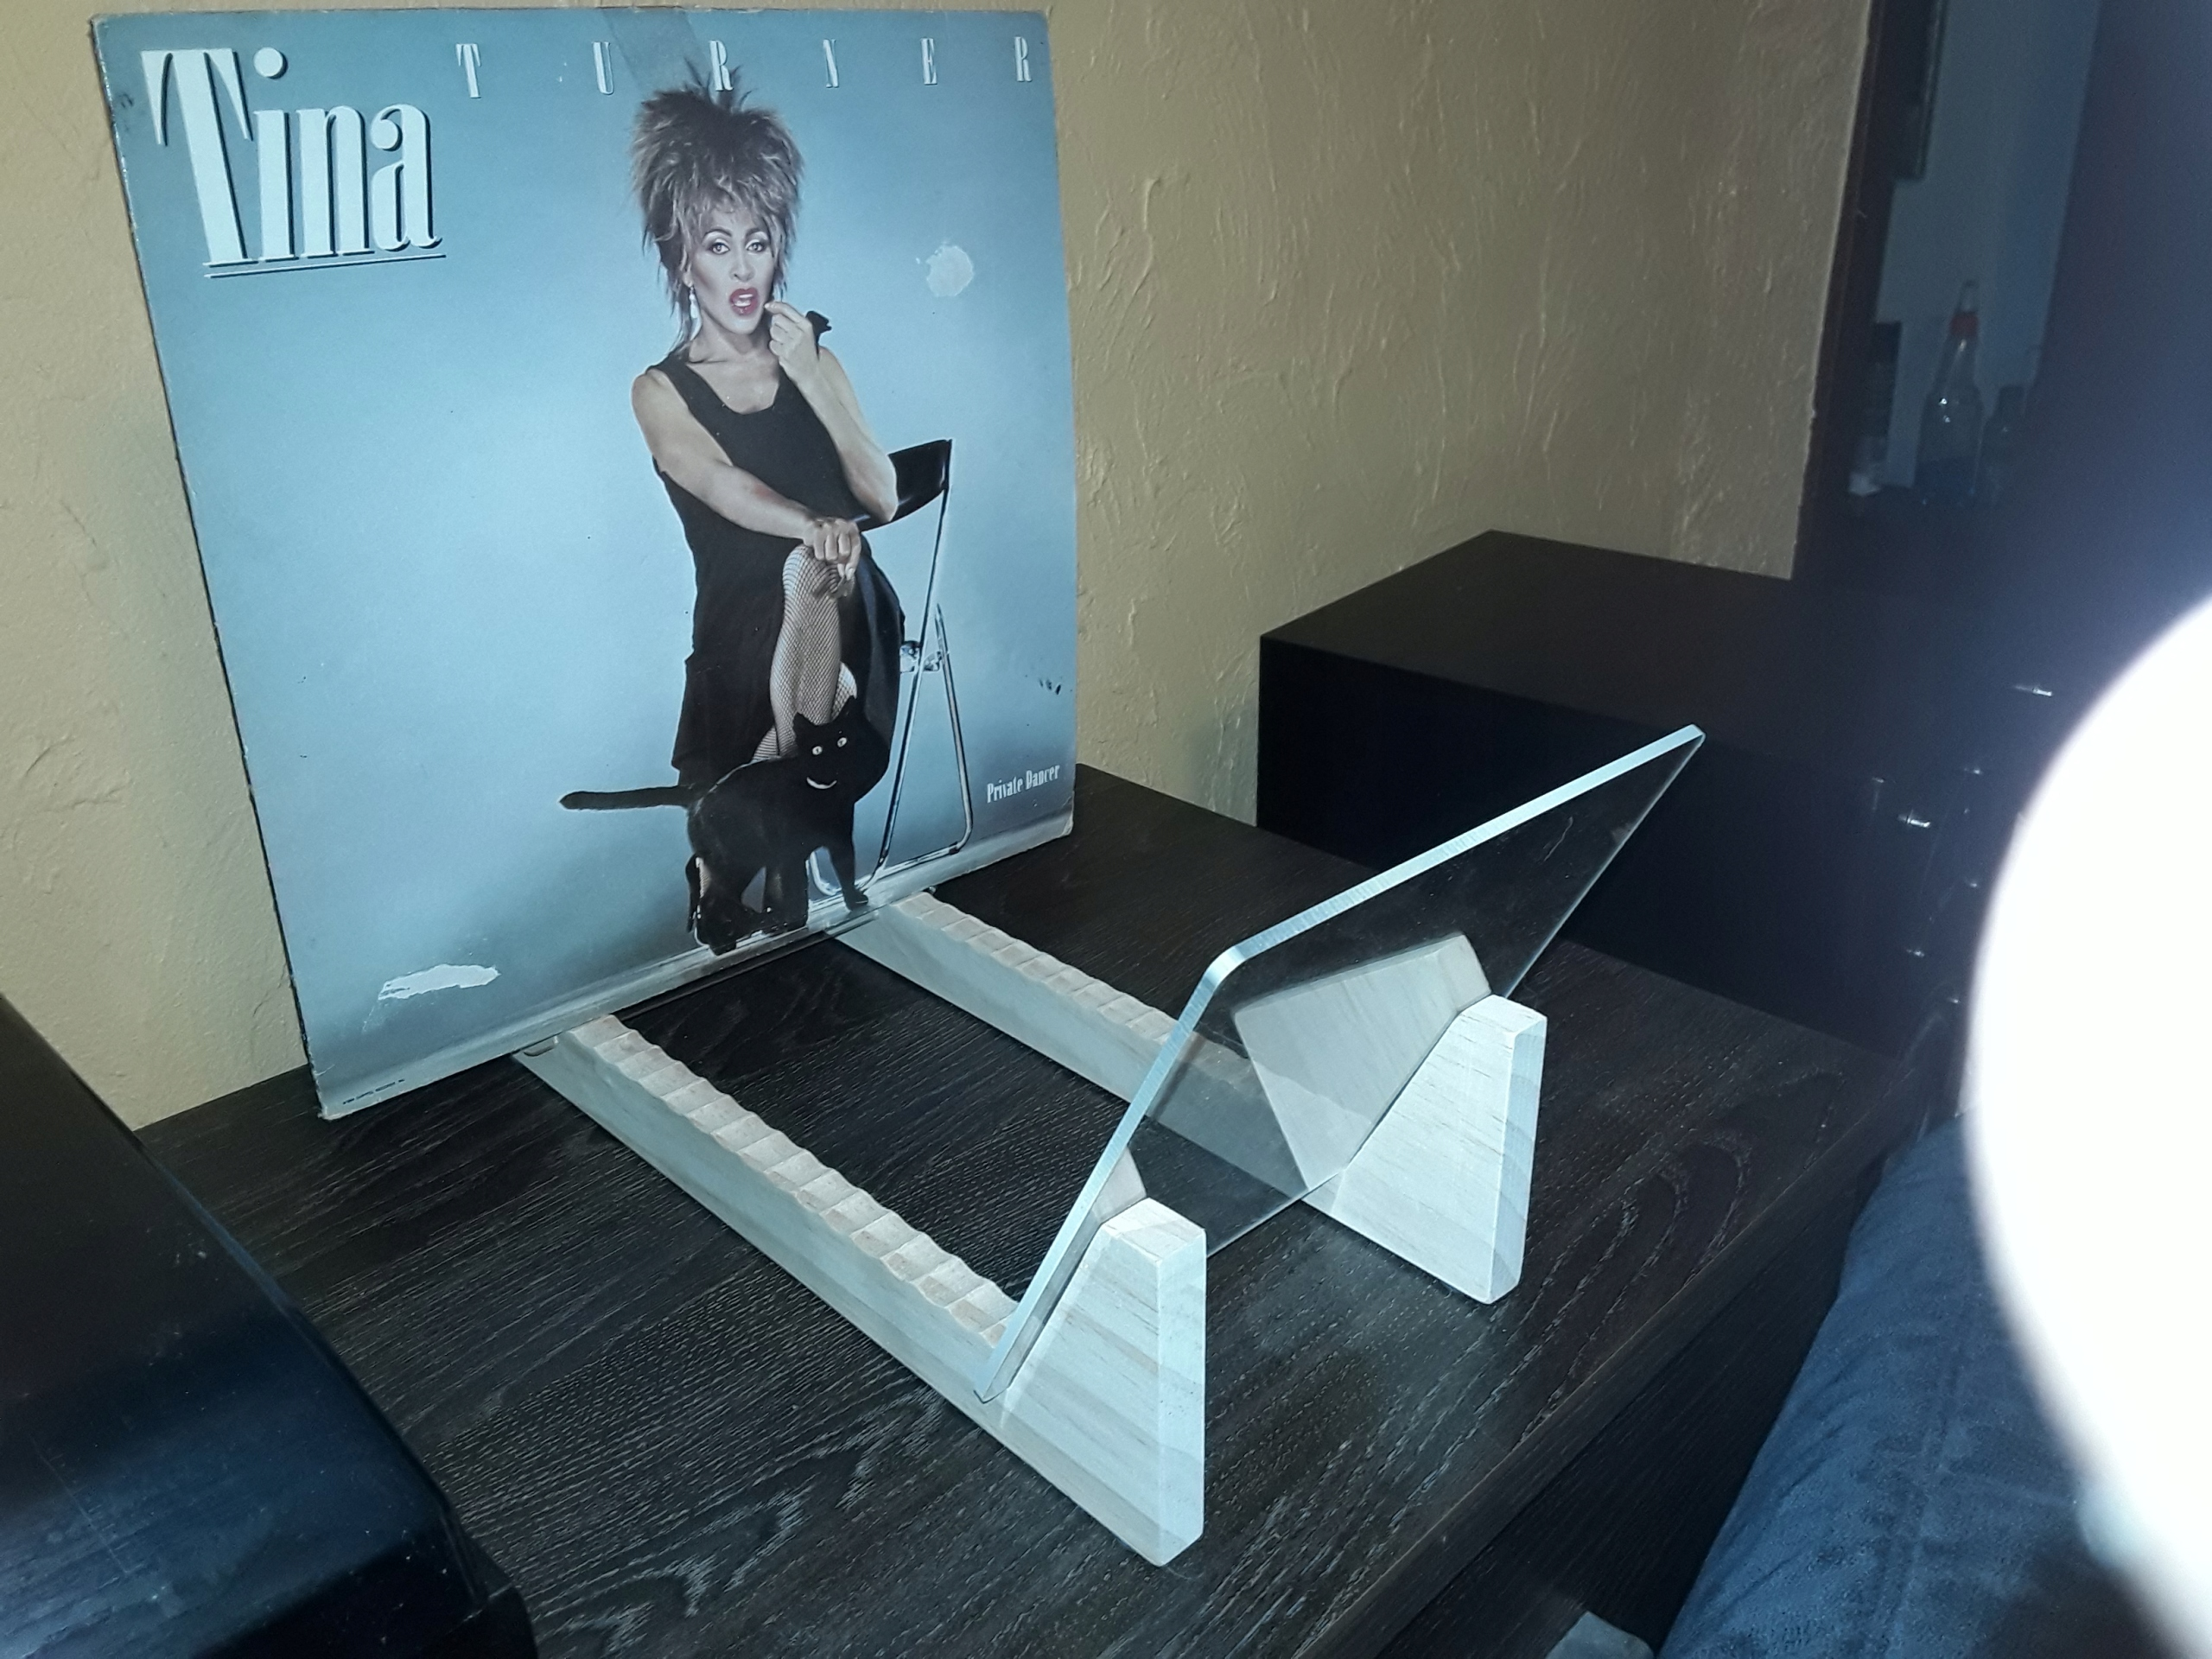 Item Stand,organizer,vinyl records, vinyls 50 discs,j